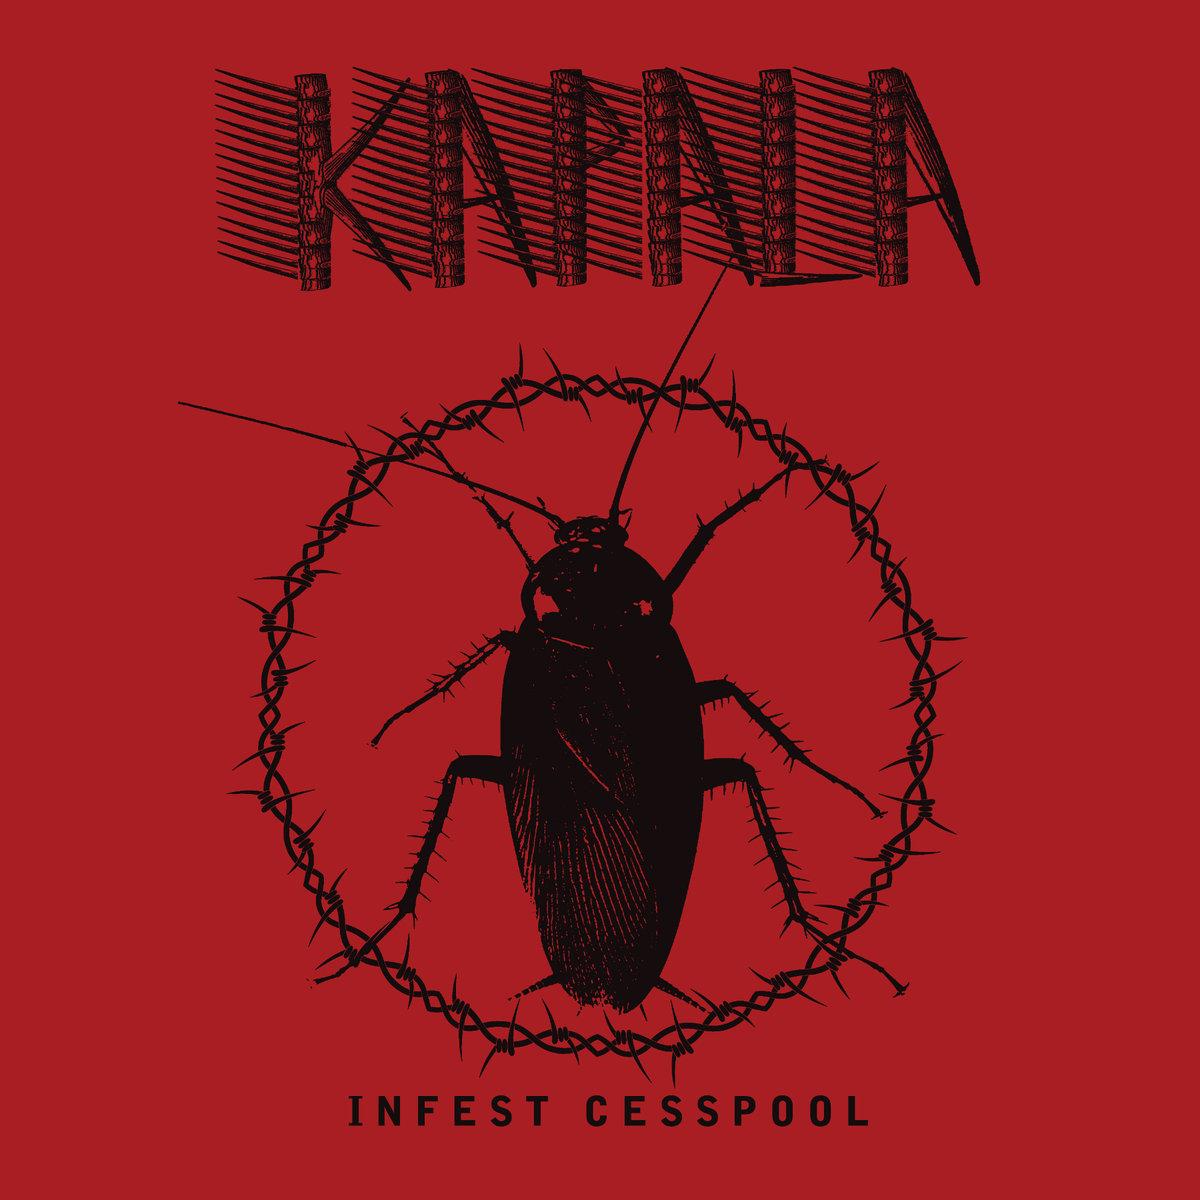 KAPALA - Infest Cesspool one sided 12